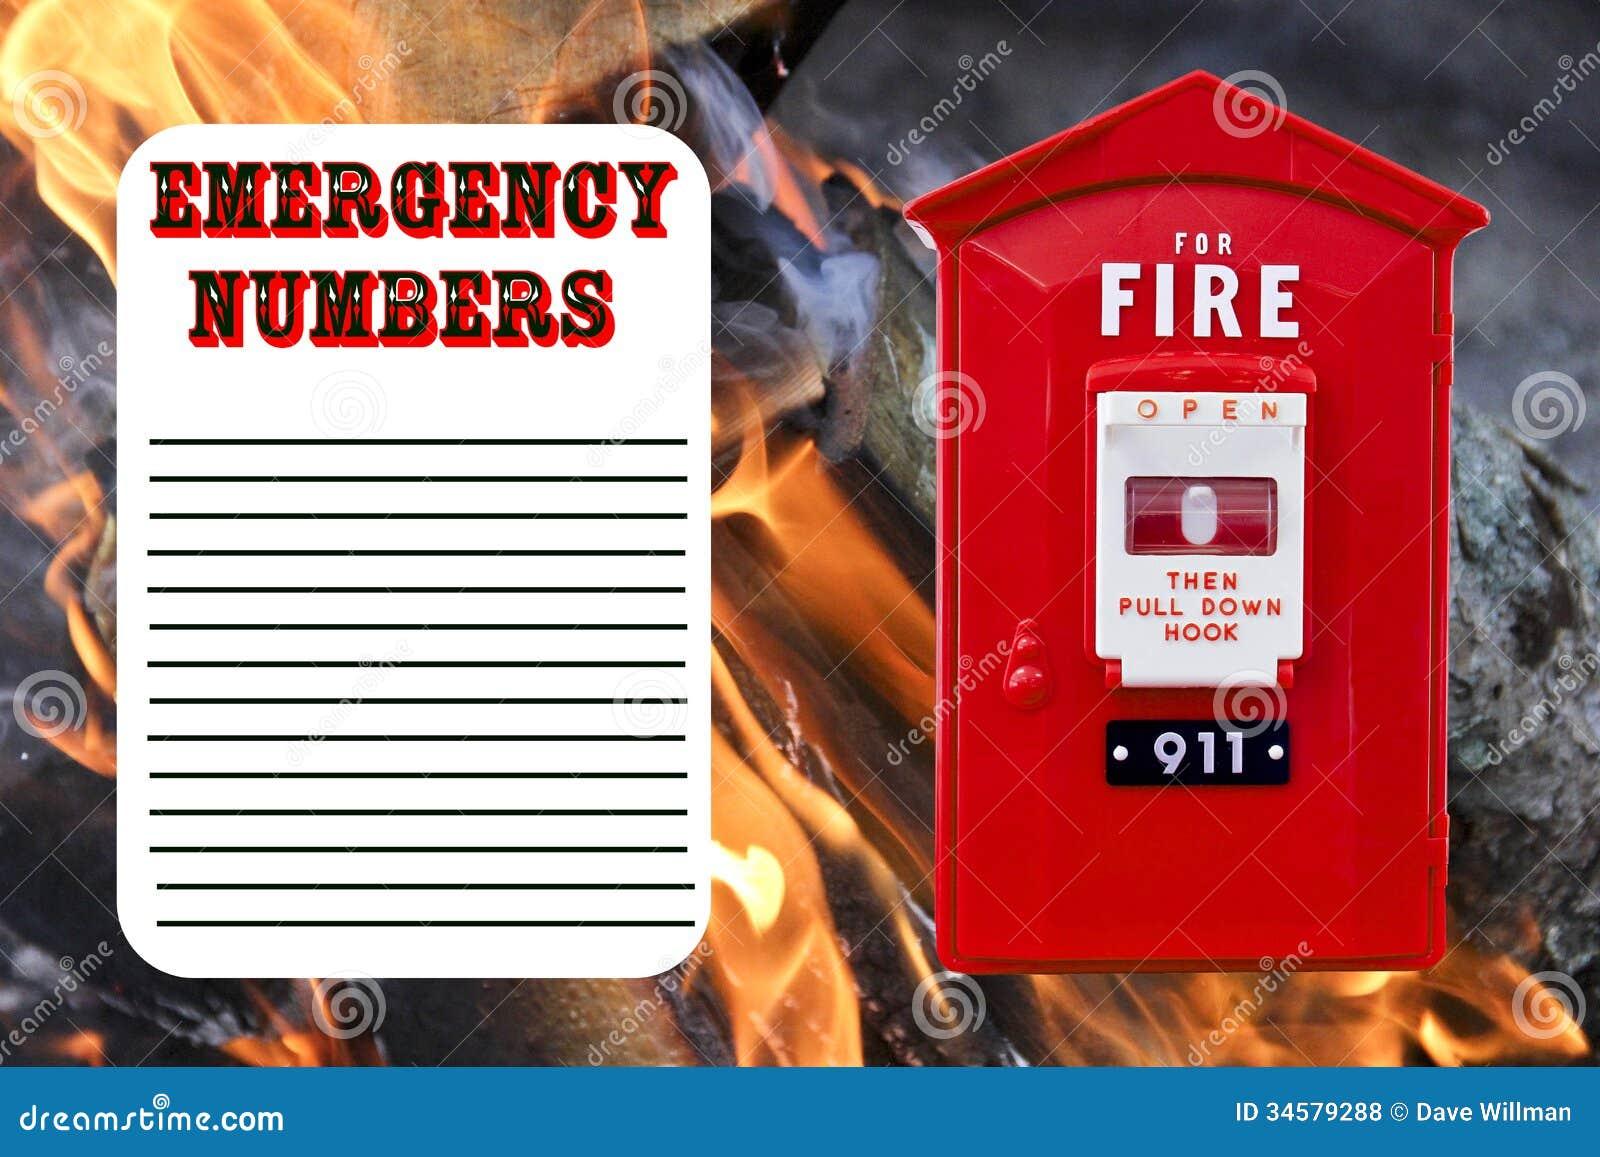 Emergency Phone Numbers List For Kids Emergency Phone Number List